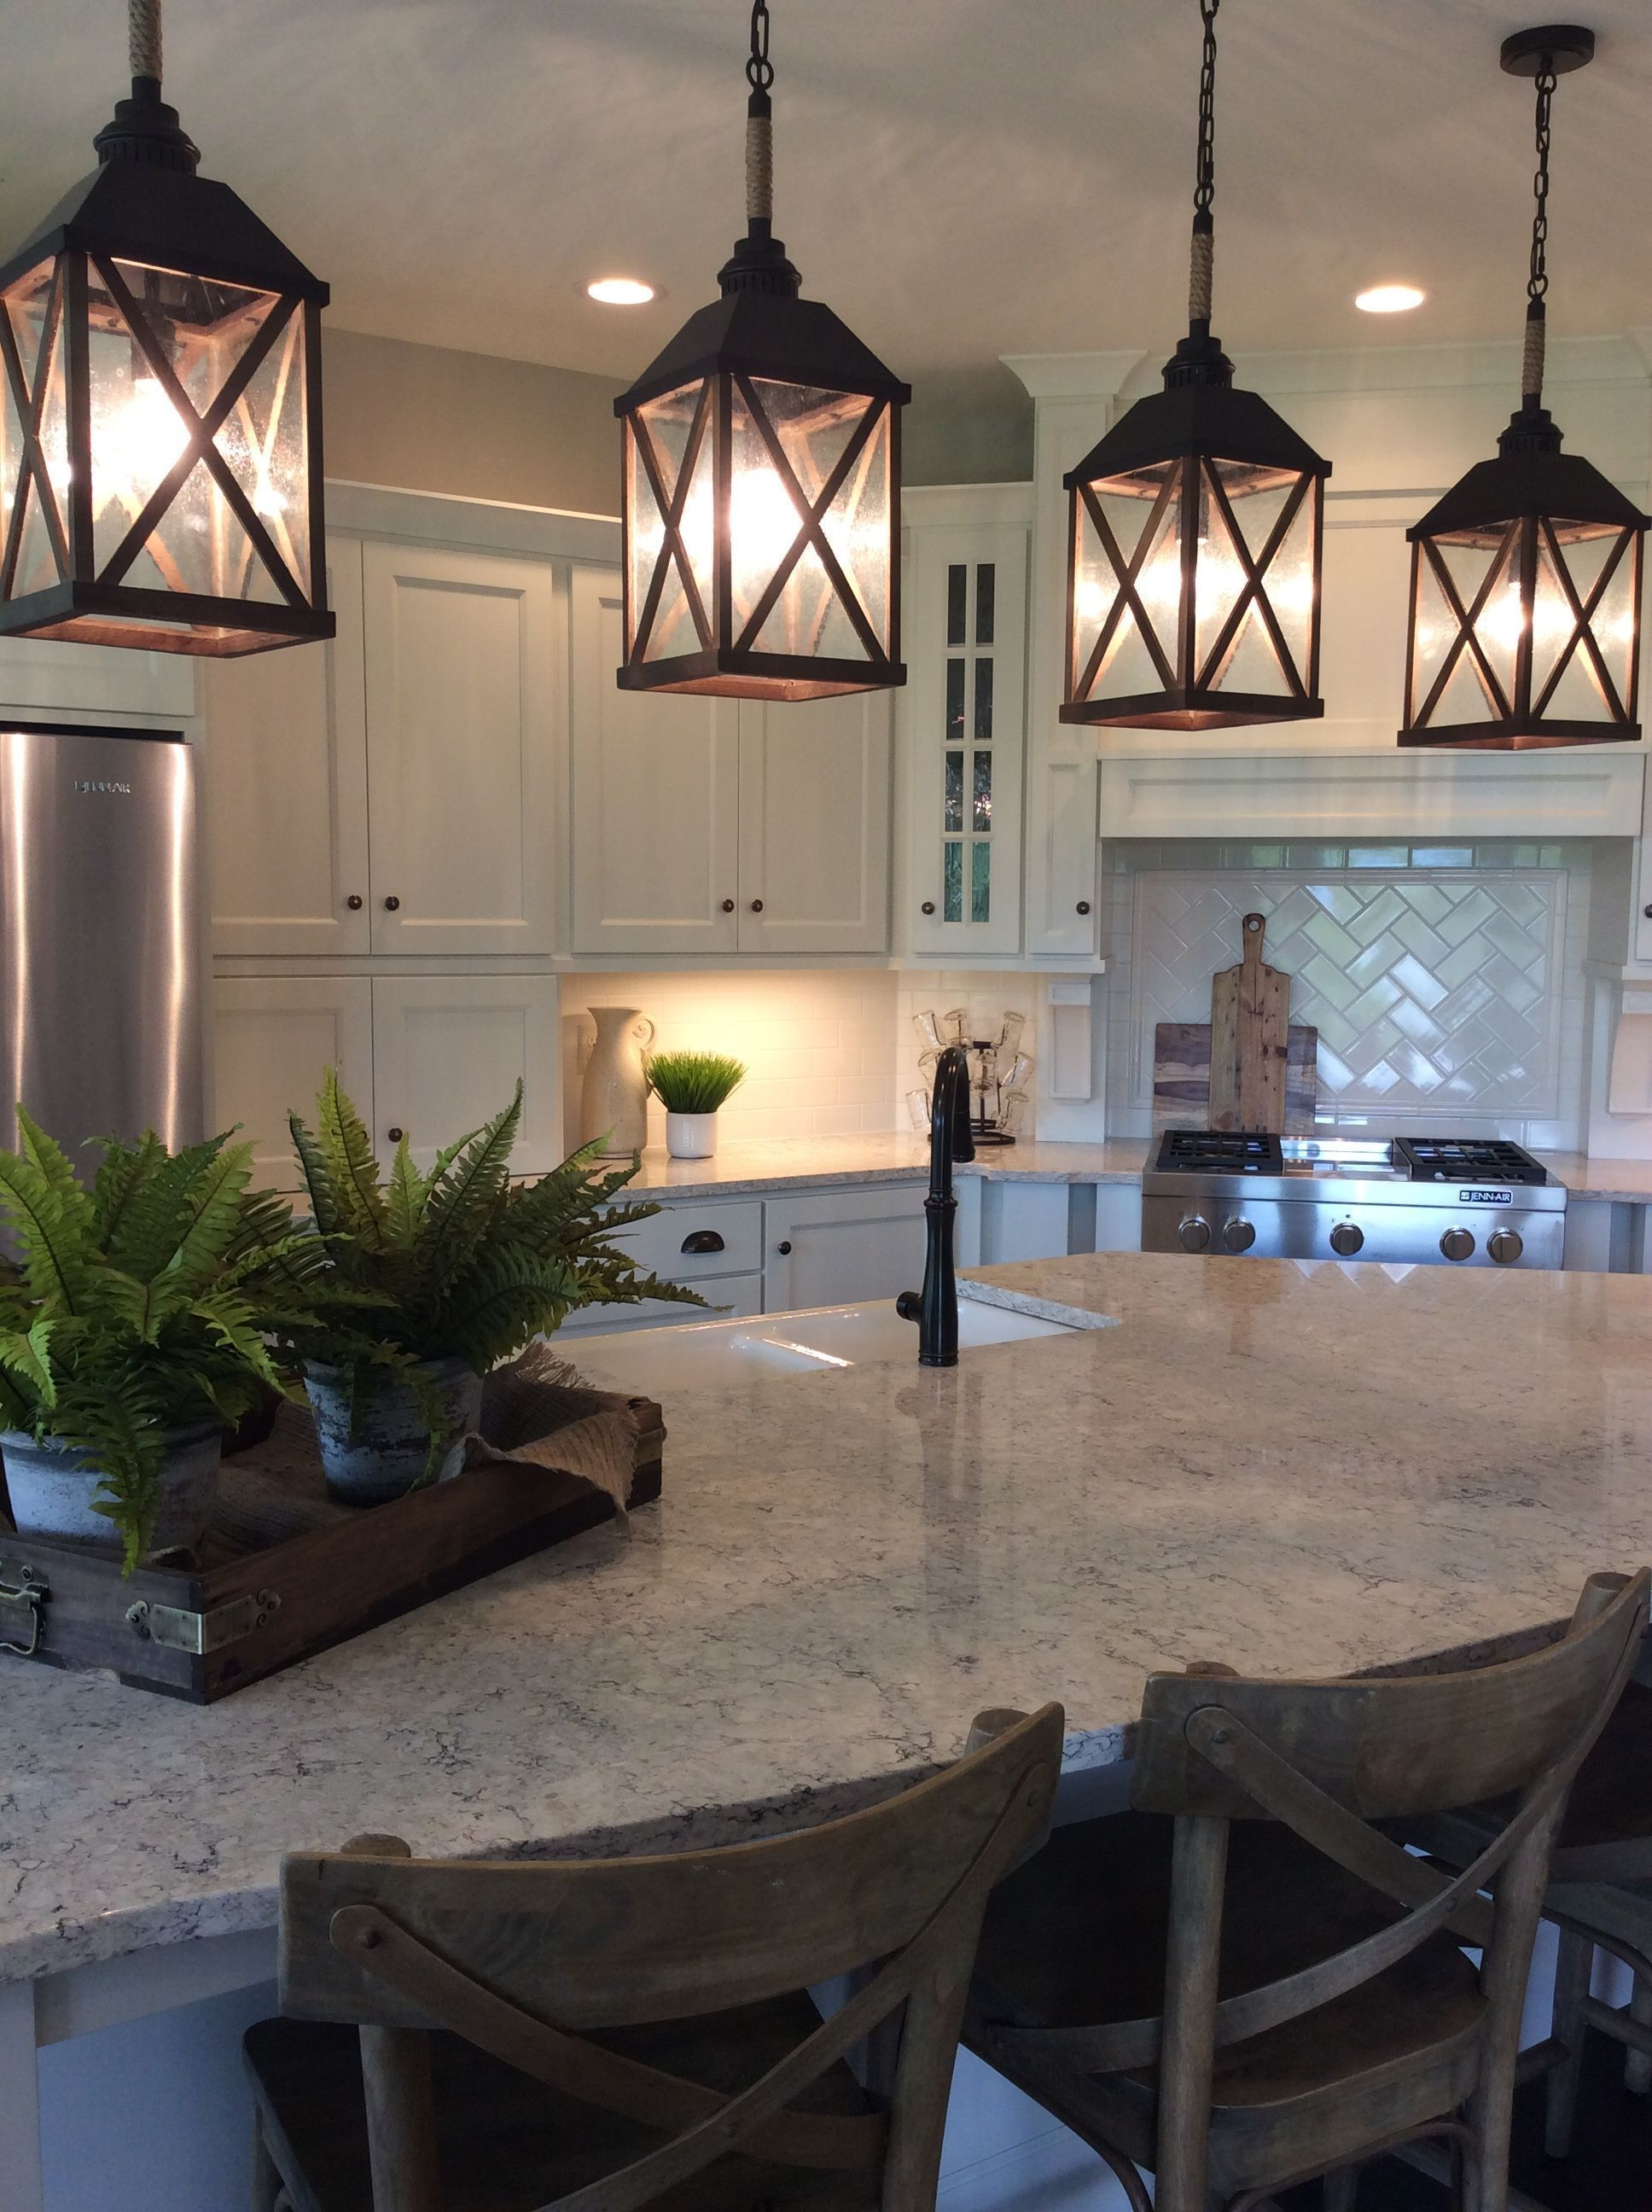 Kitchen Lighting Fixtures Ideas You Ll Love Recesslightinginkitchen Kitchen Island Lighting Home Decor Kitchen Kitchen Lighting Fixtures